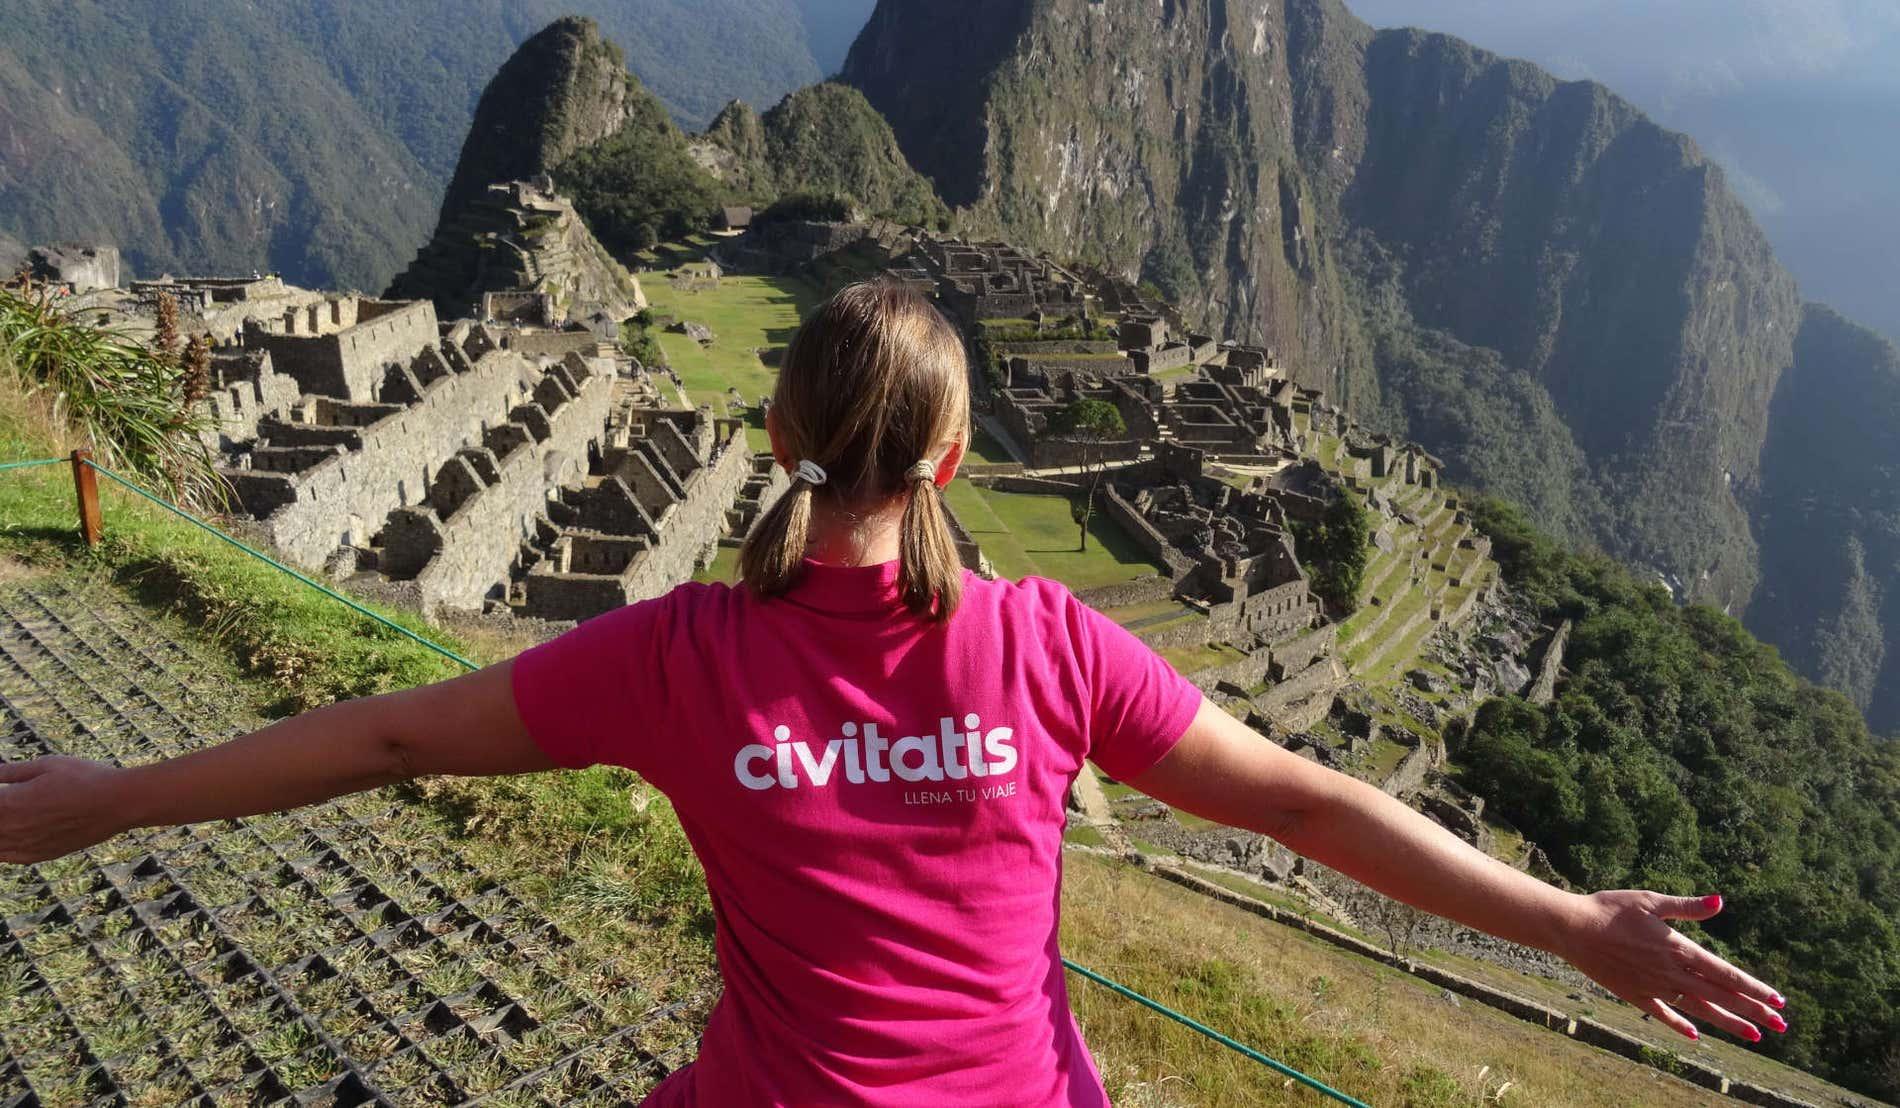 #CivitatisInsider: Inmaculada López, Regional Manager de América & APAC